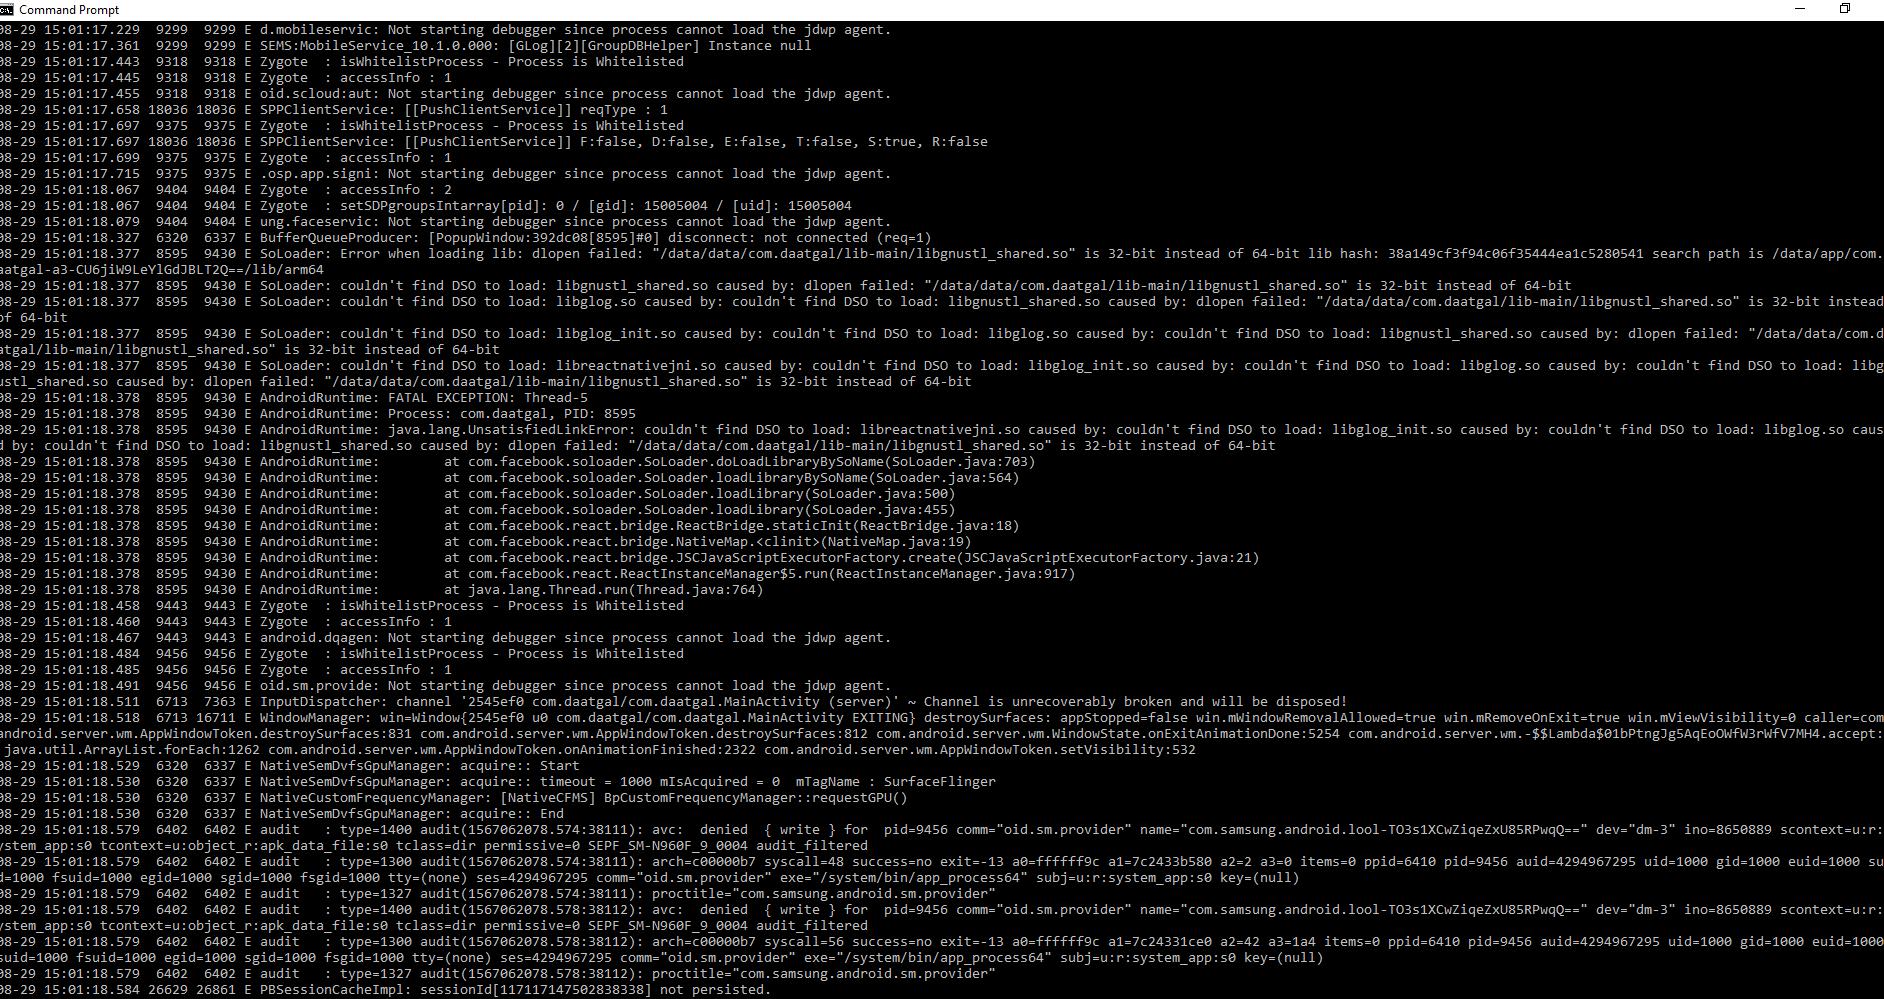 Release APK crash immediately on launch - React Native